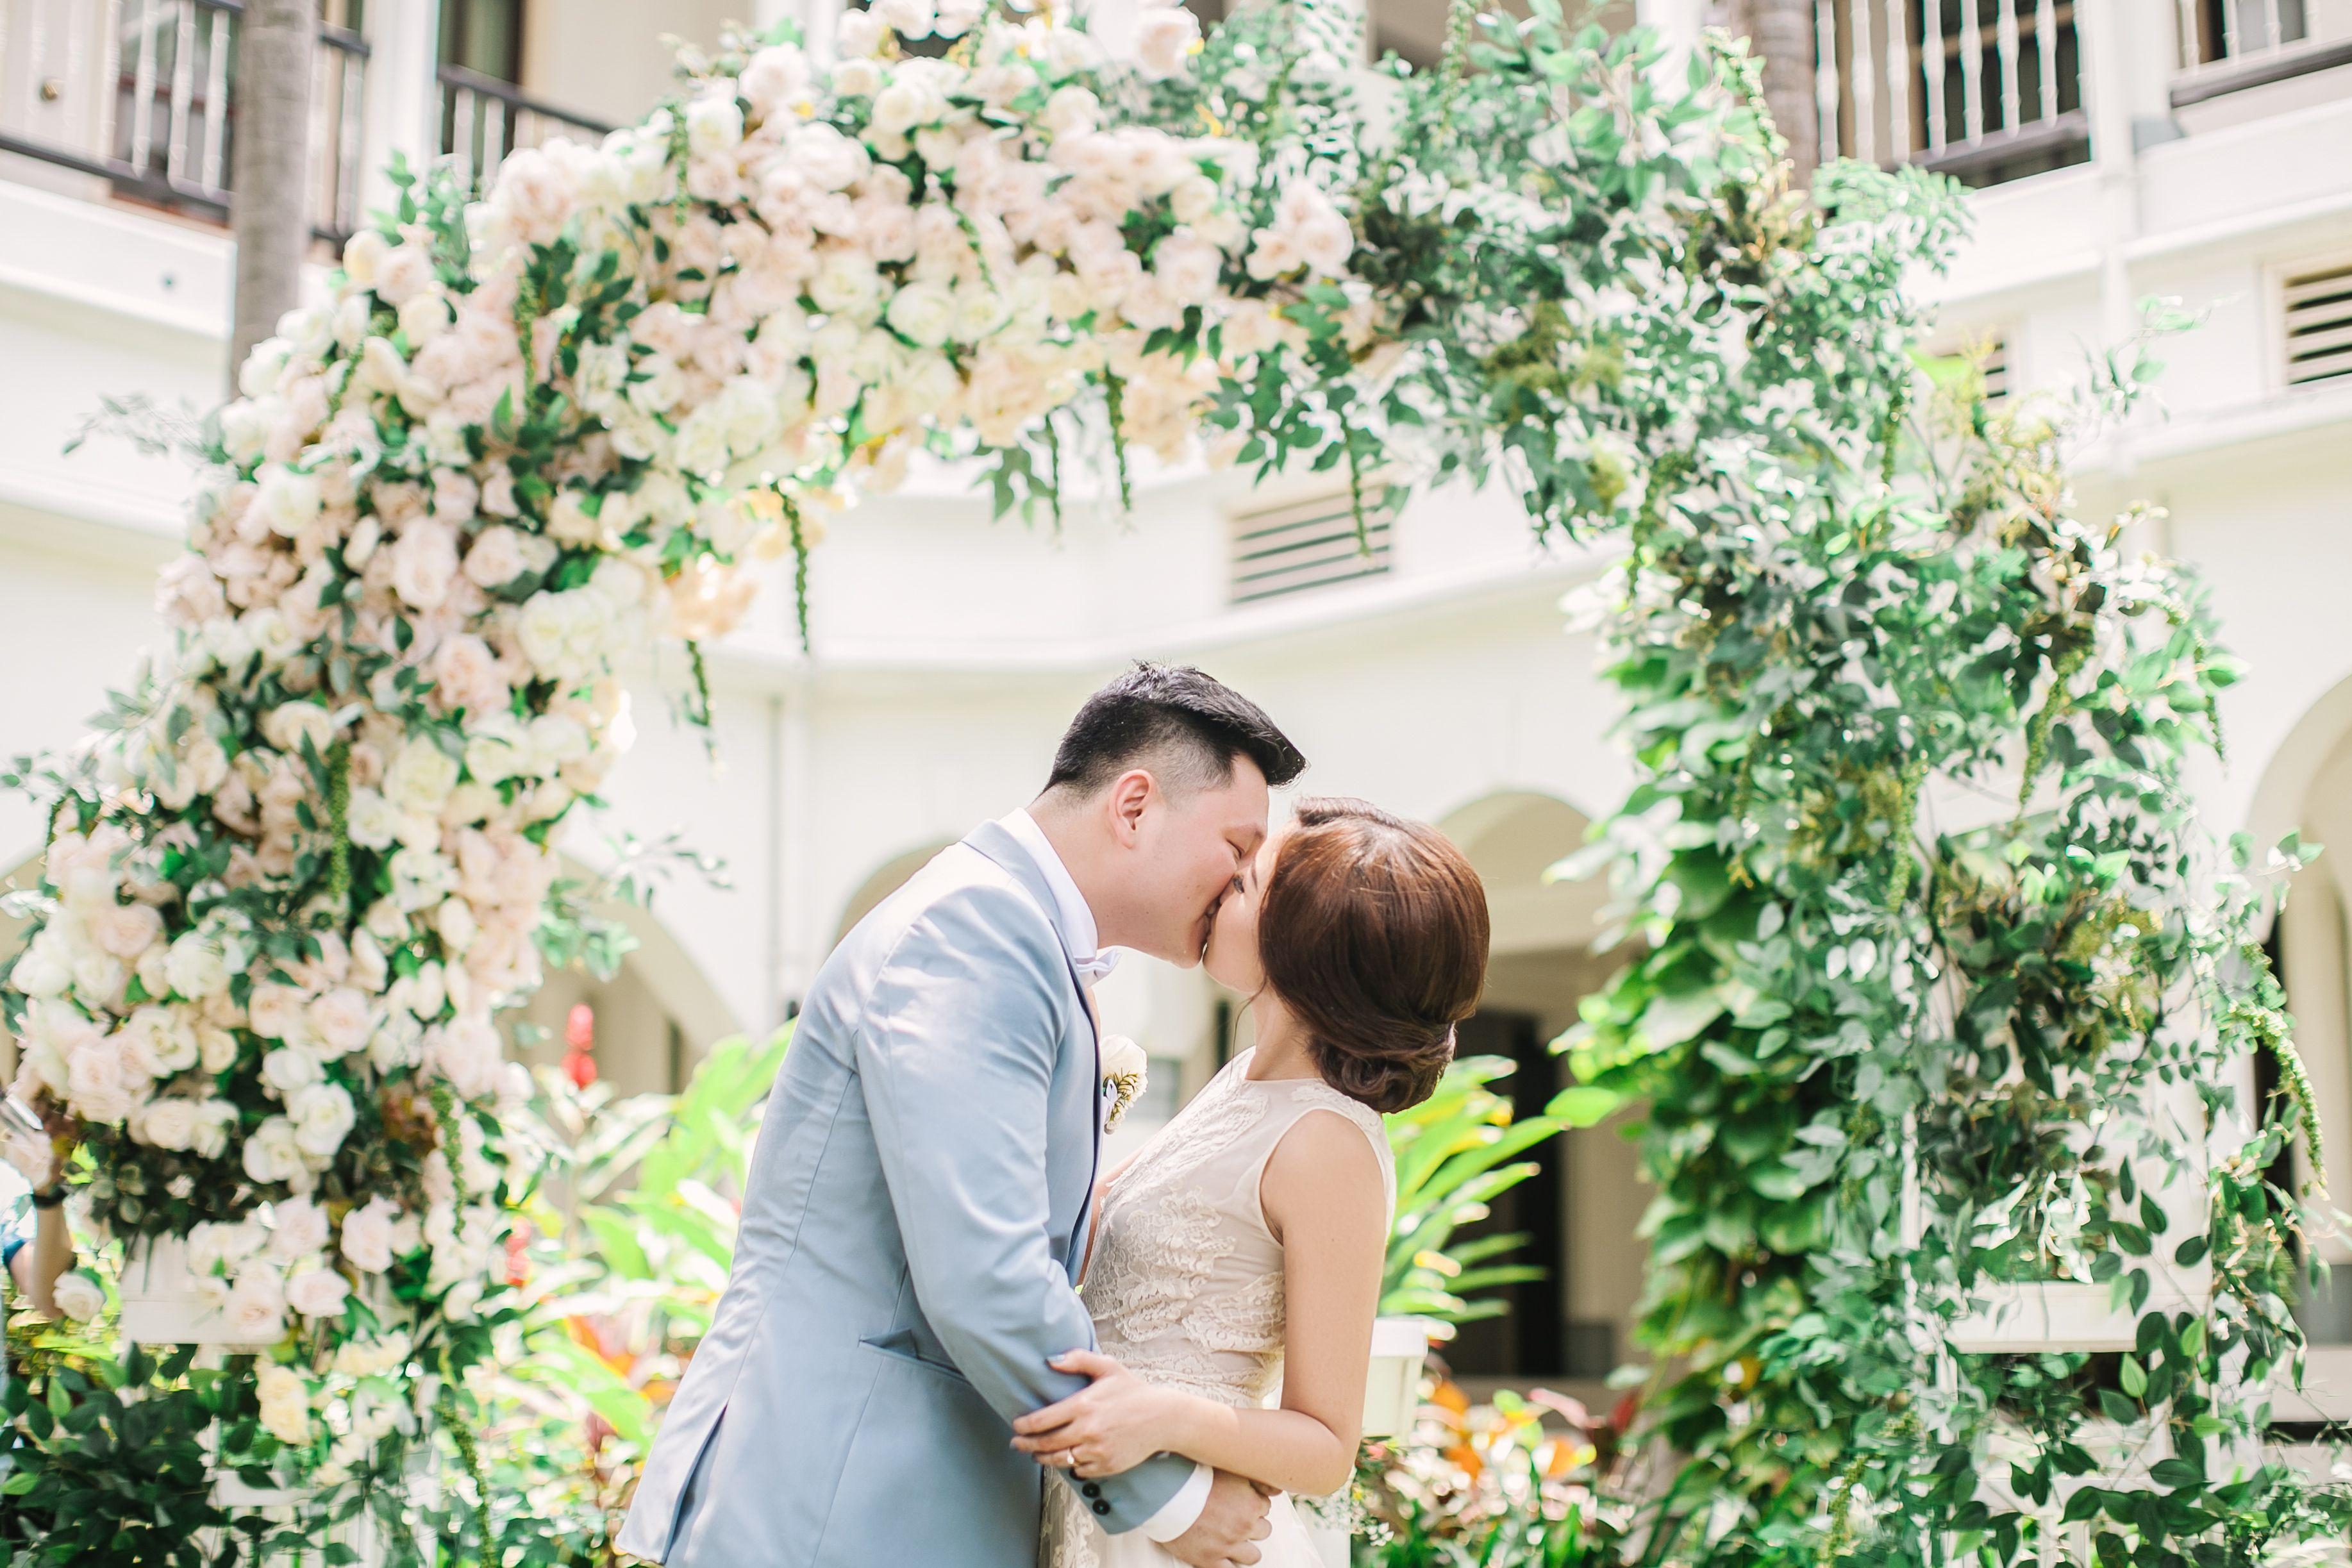 An Intimate Garden Wedding at Hotel Majapahit, Surabaya Image 1